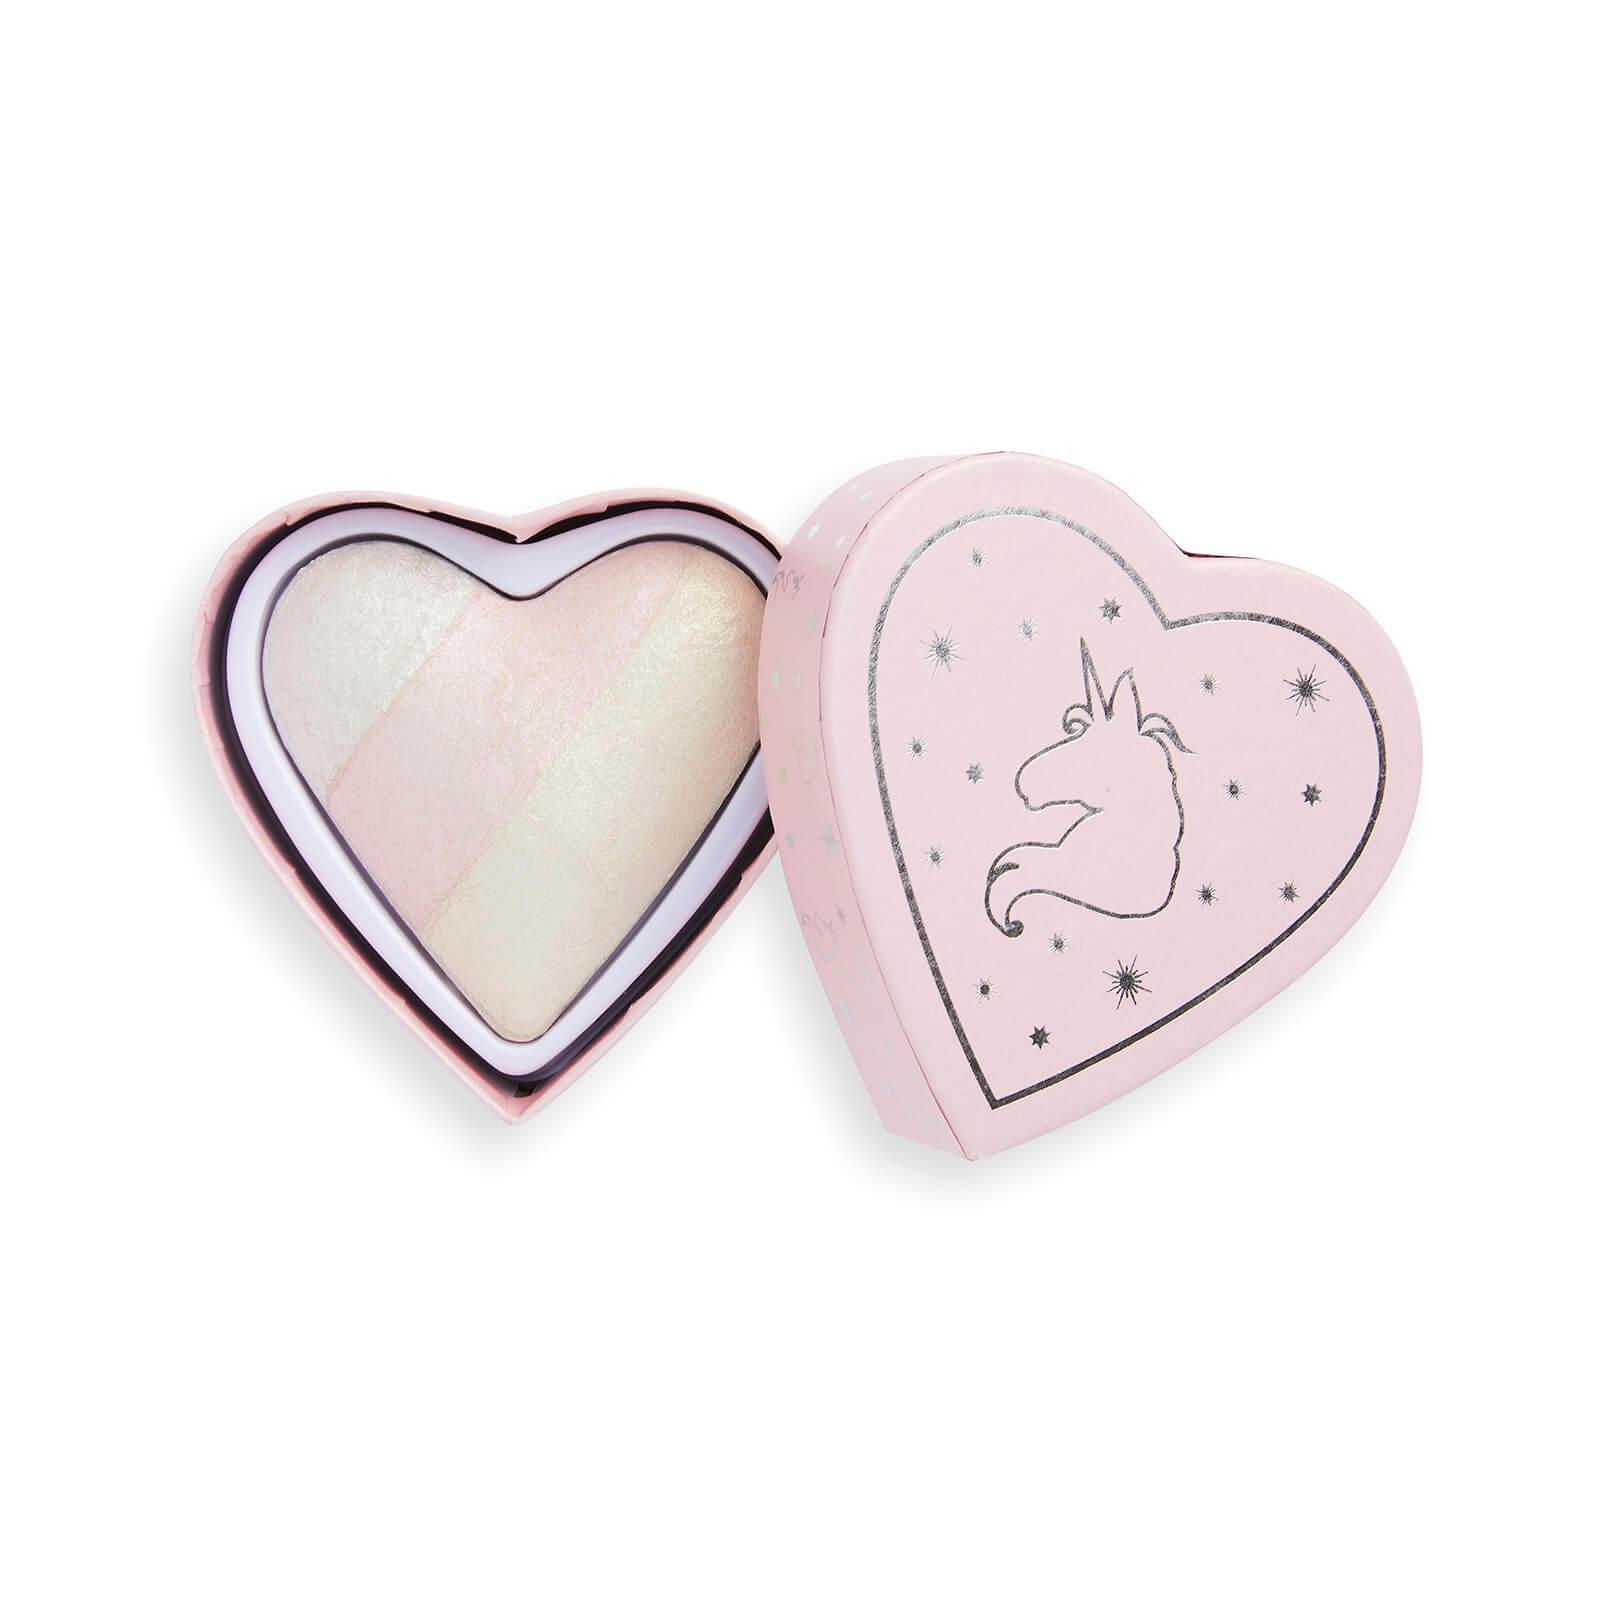 Купить Хайлайтер для лица Revolution Beauty I Heart Revolution Unicorn Heart Glow Heart Хайлайтер с сердечками